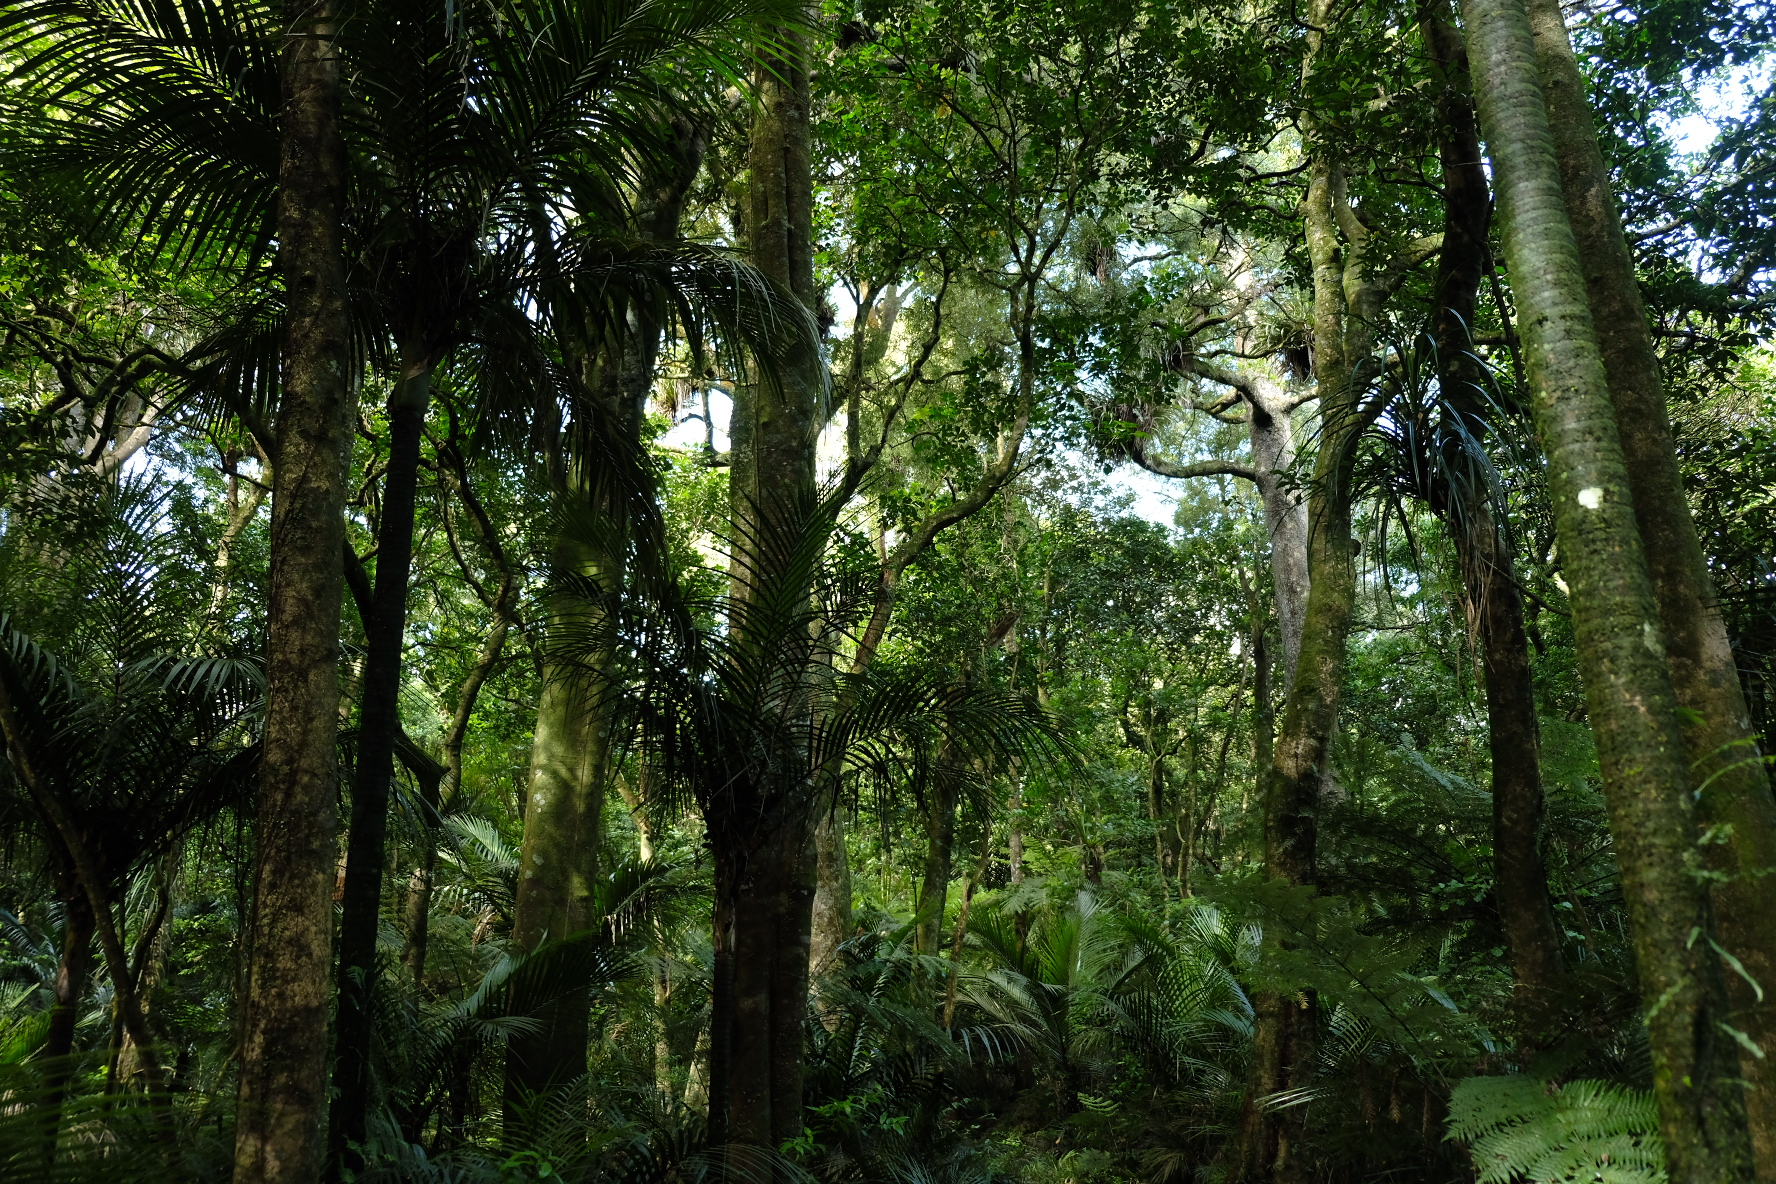 Beautiful forests in the Hakarimata range over Ngaruawahia